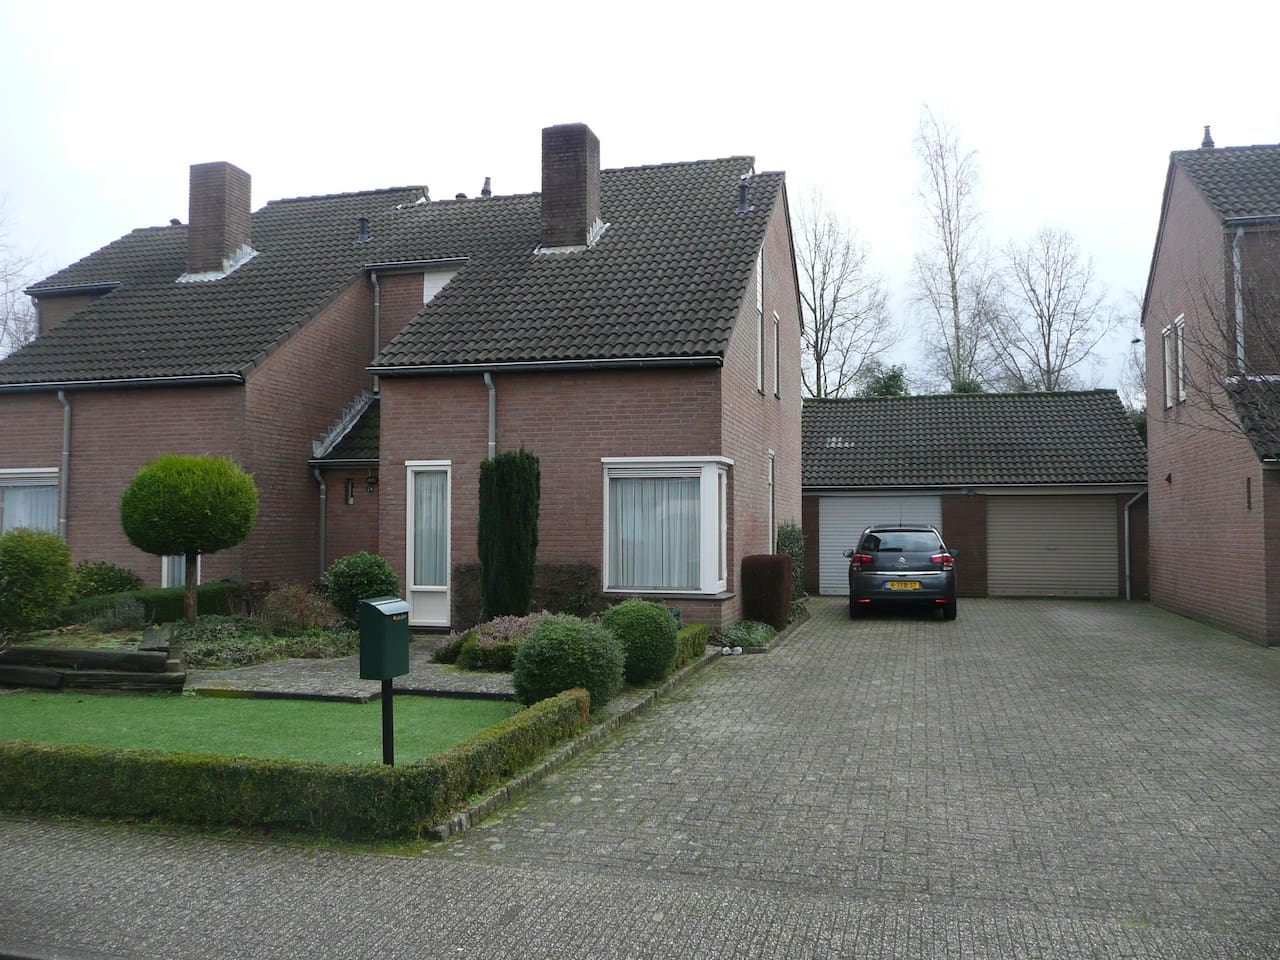 Huis met garage en grote inrit